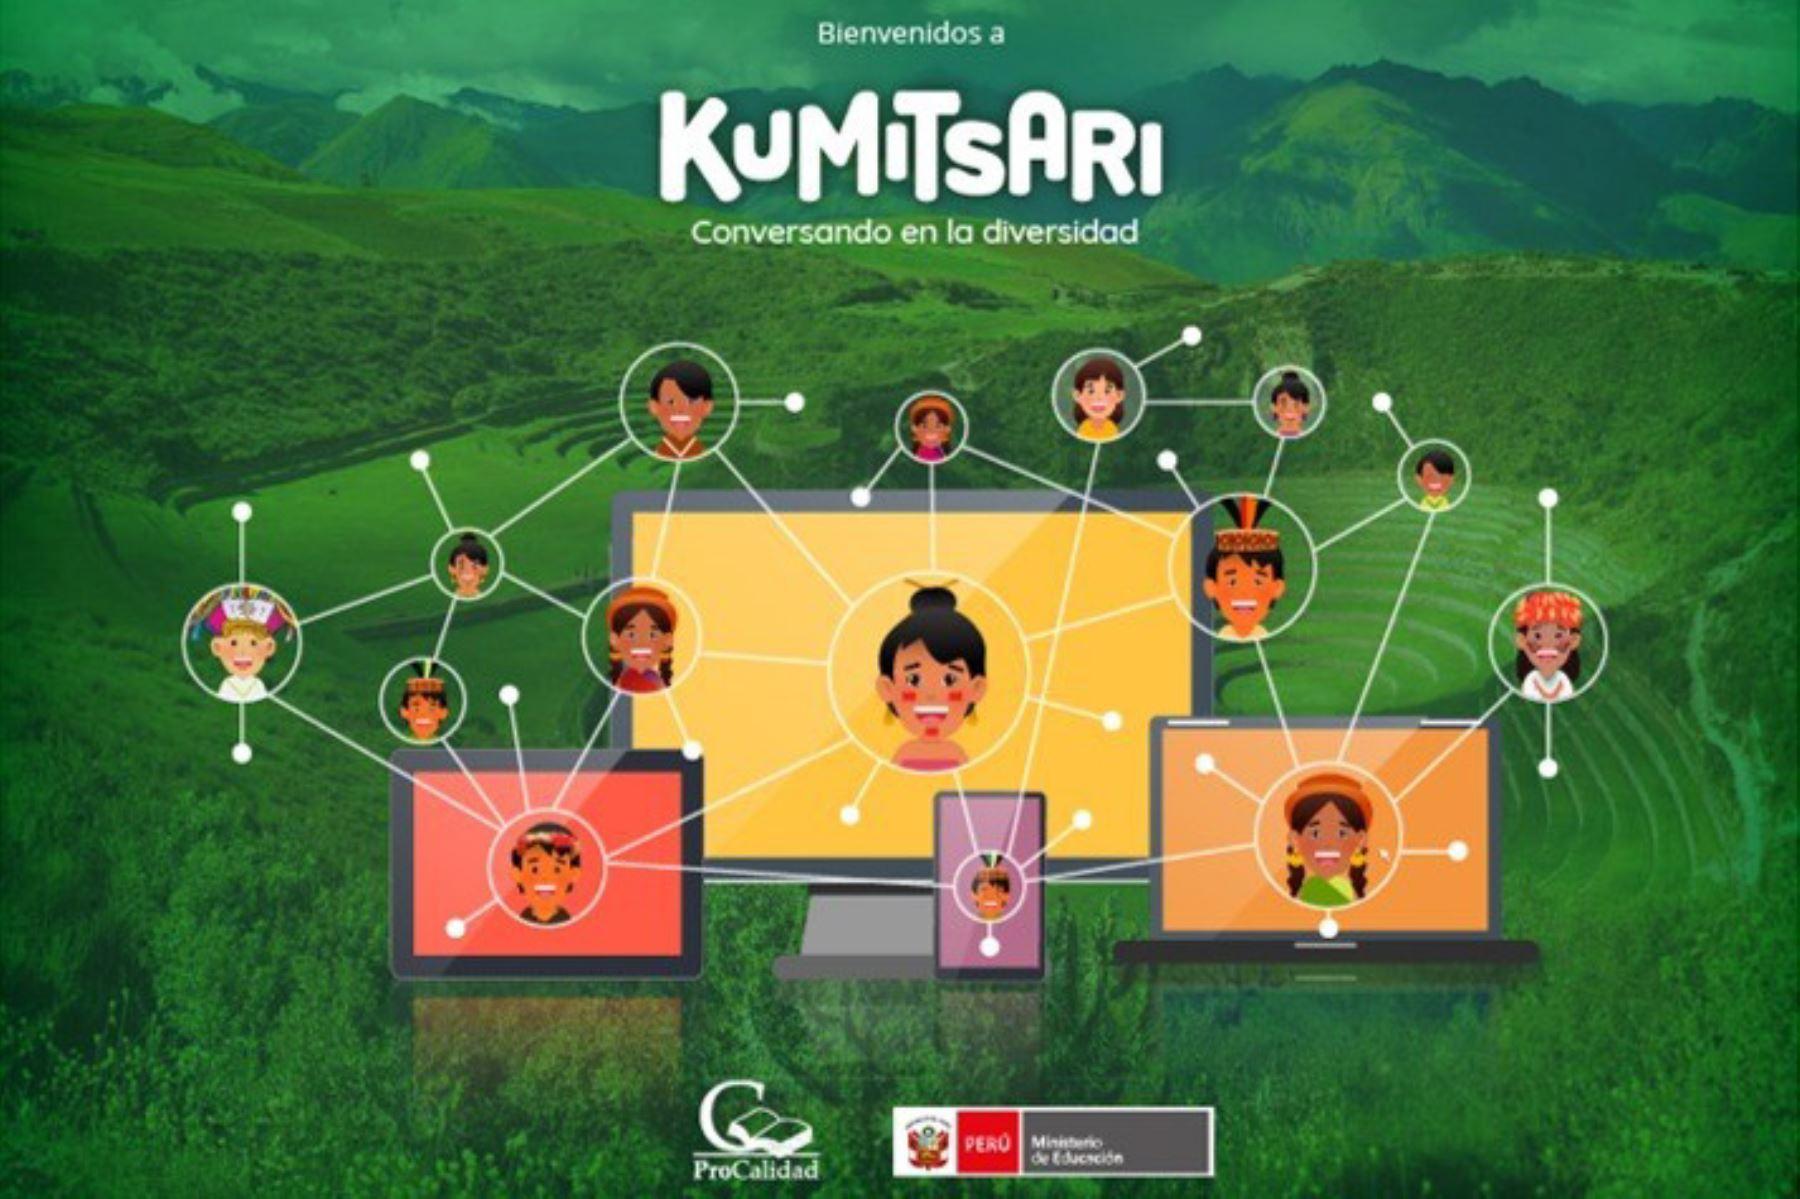 Maestros aprenden lenguas originarias con programa digital Kumitsari